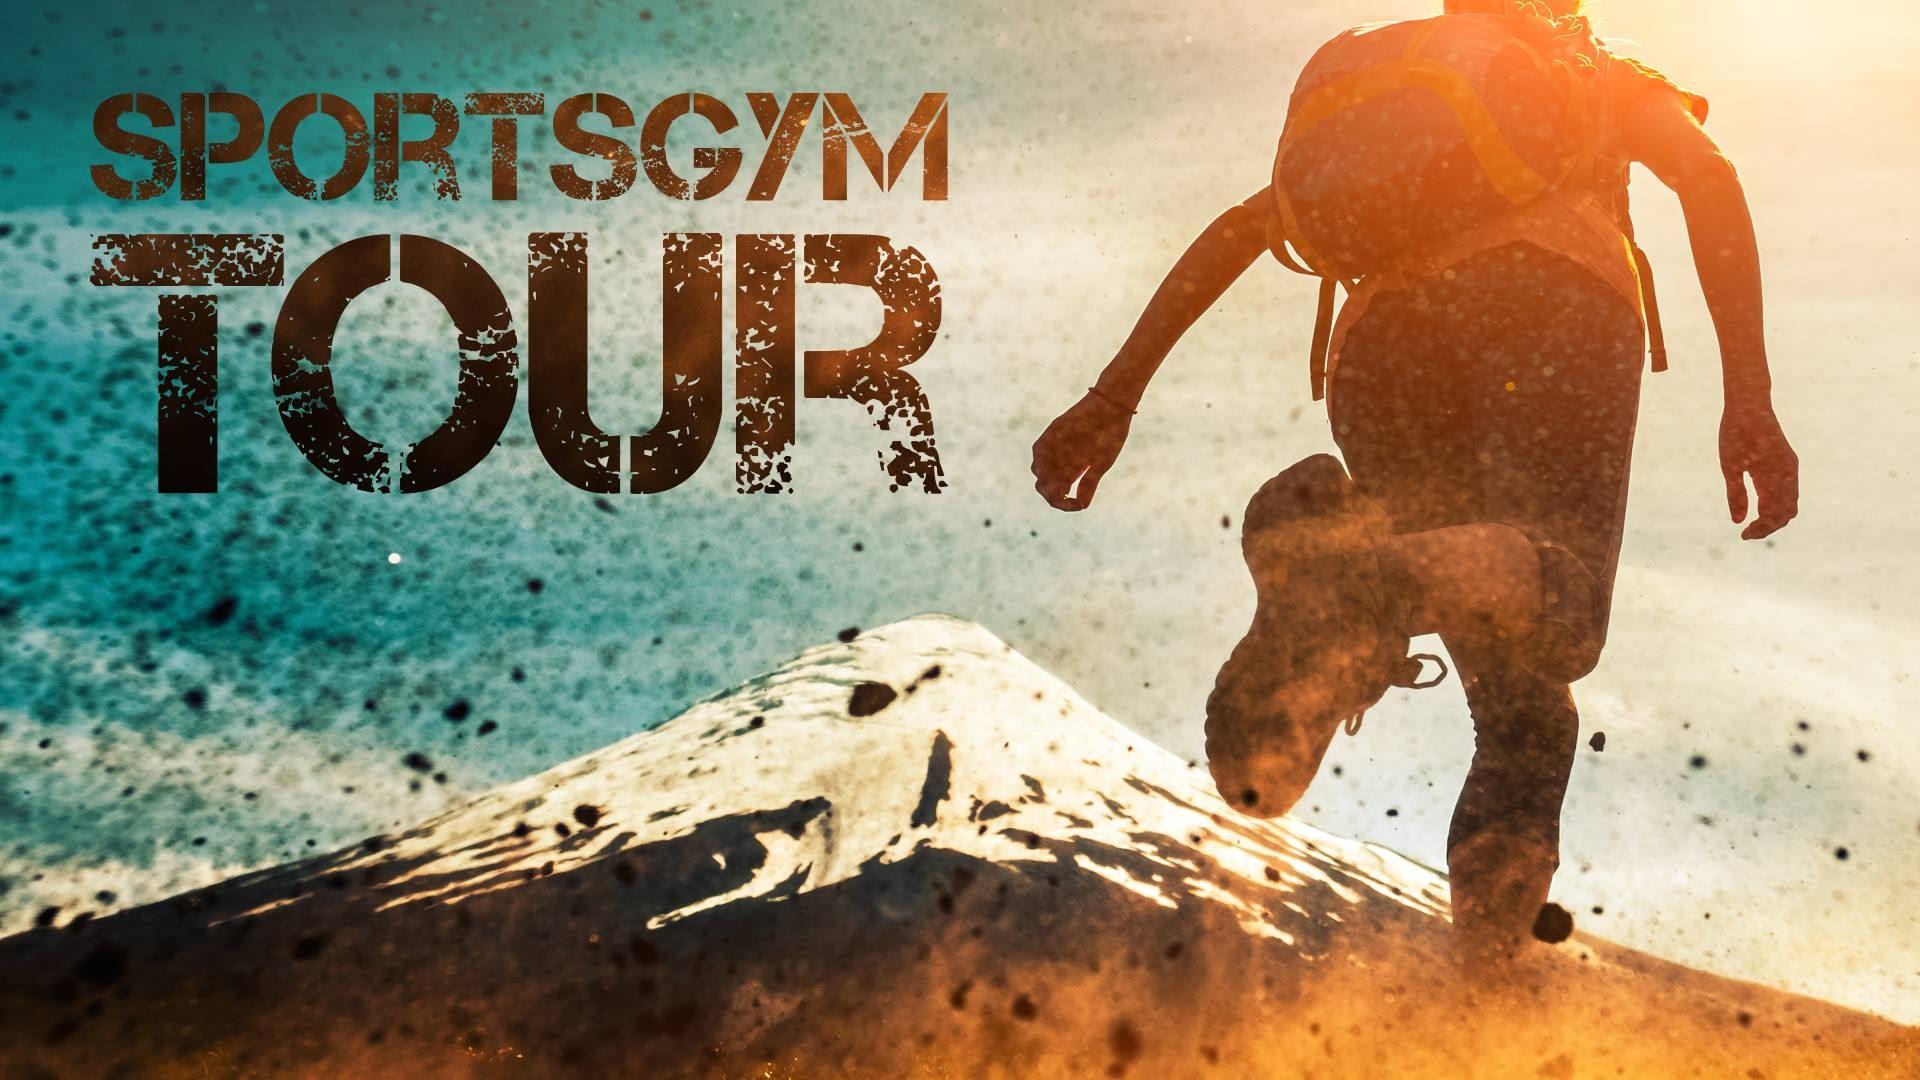 © SportsGym Tour, Sportsgym Trail